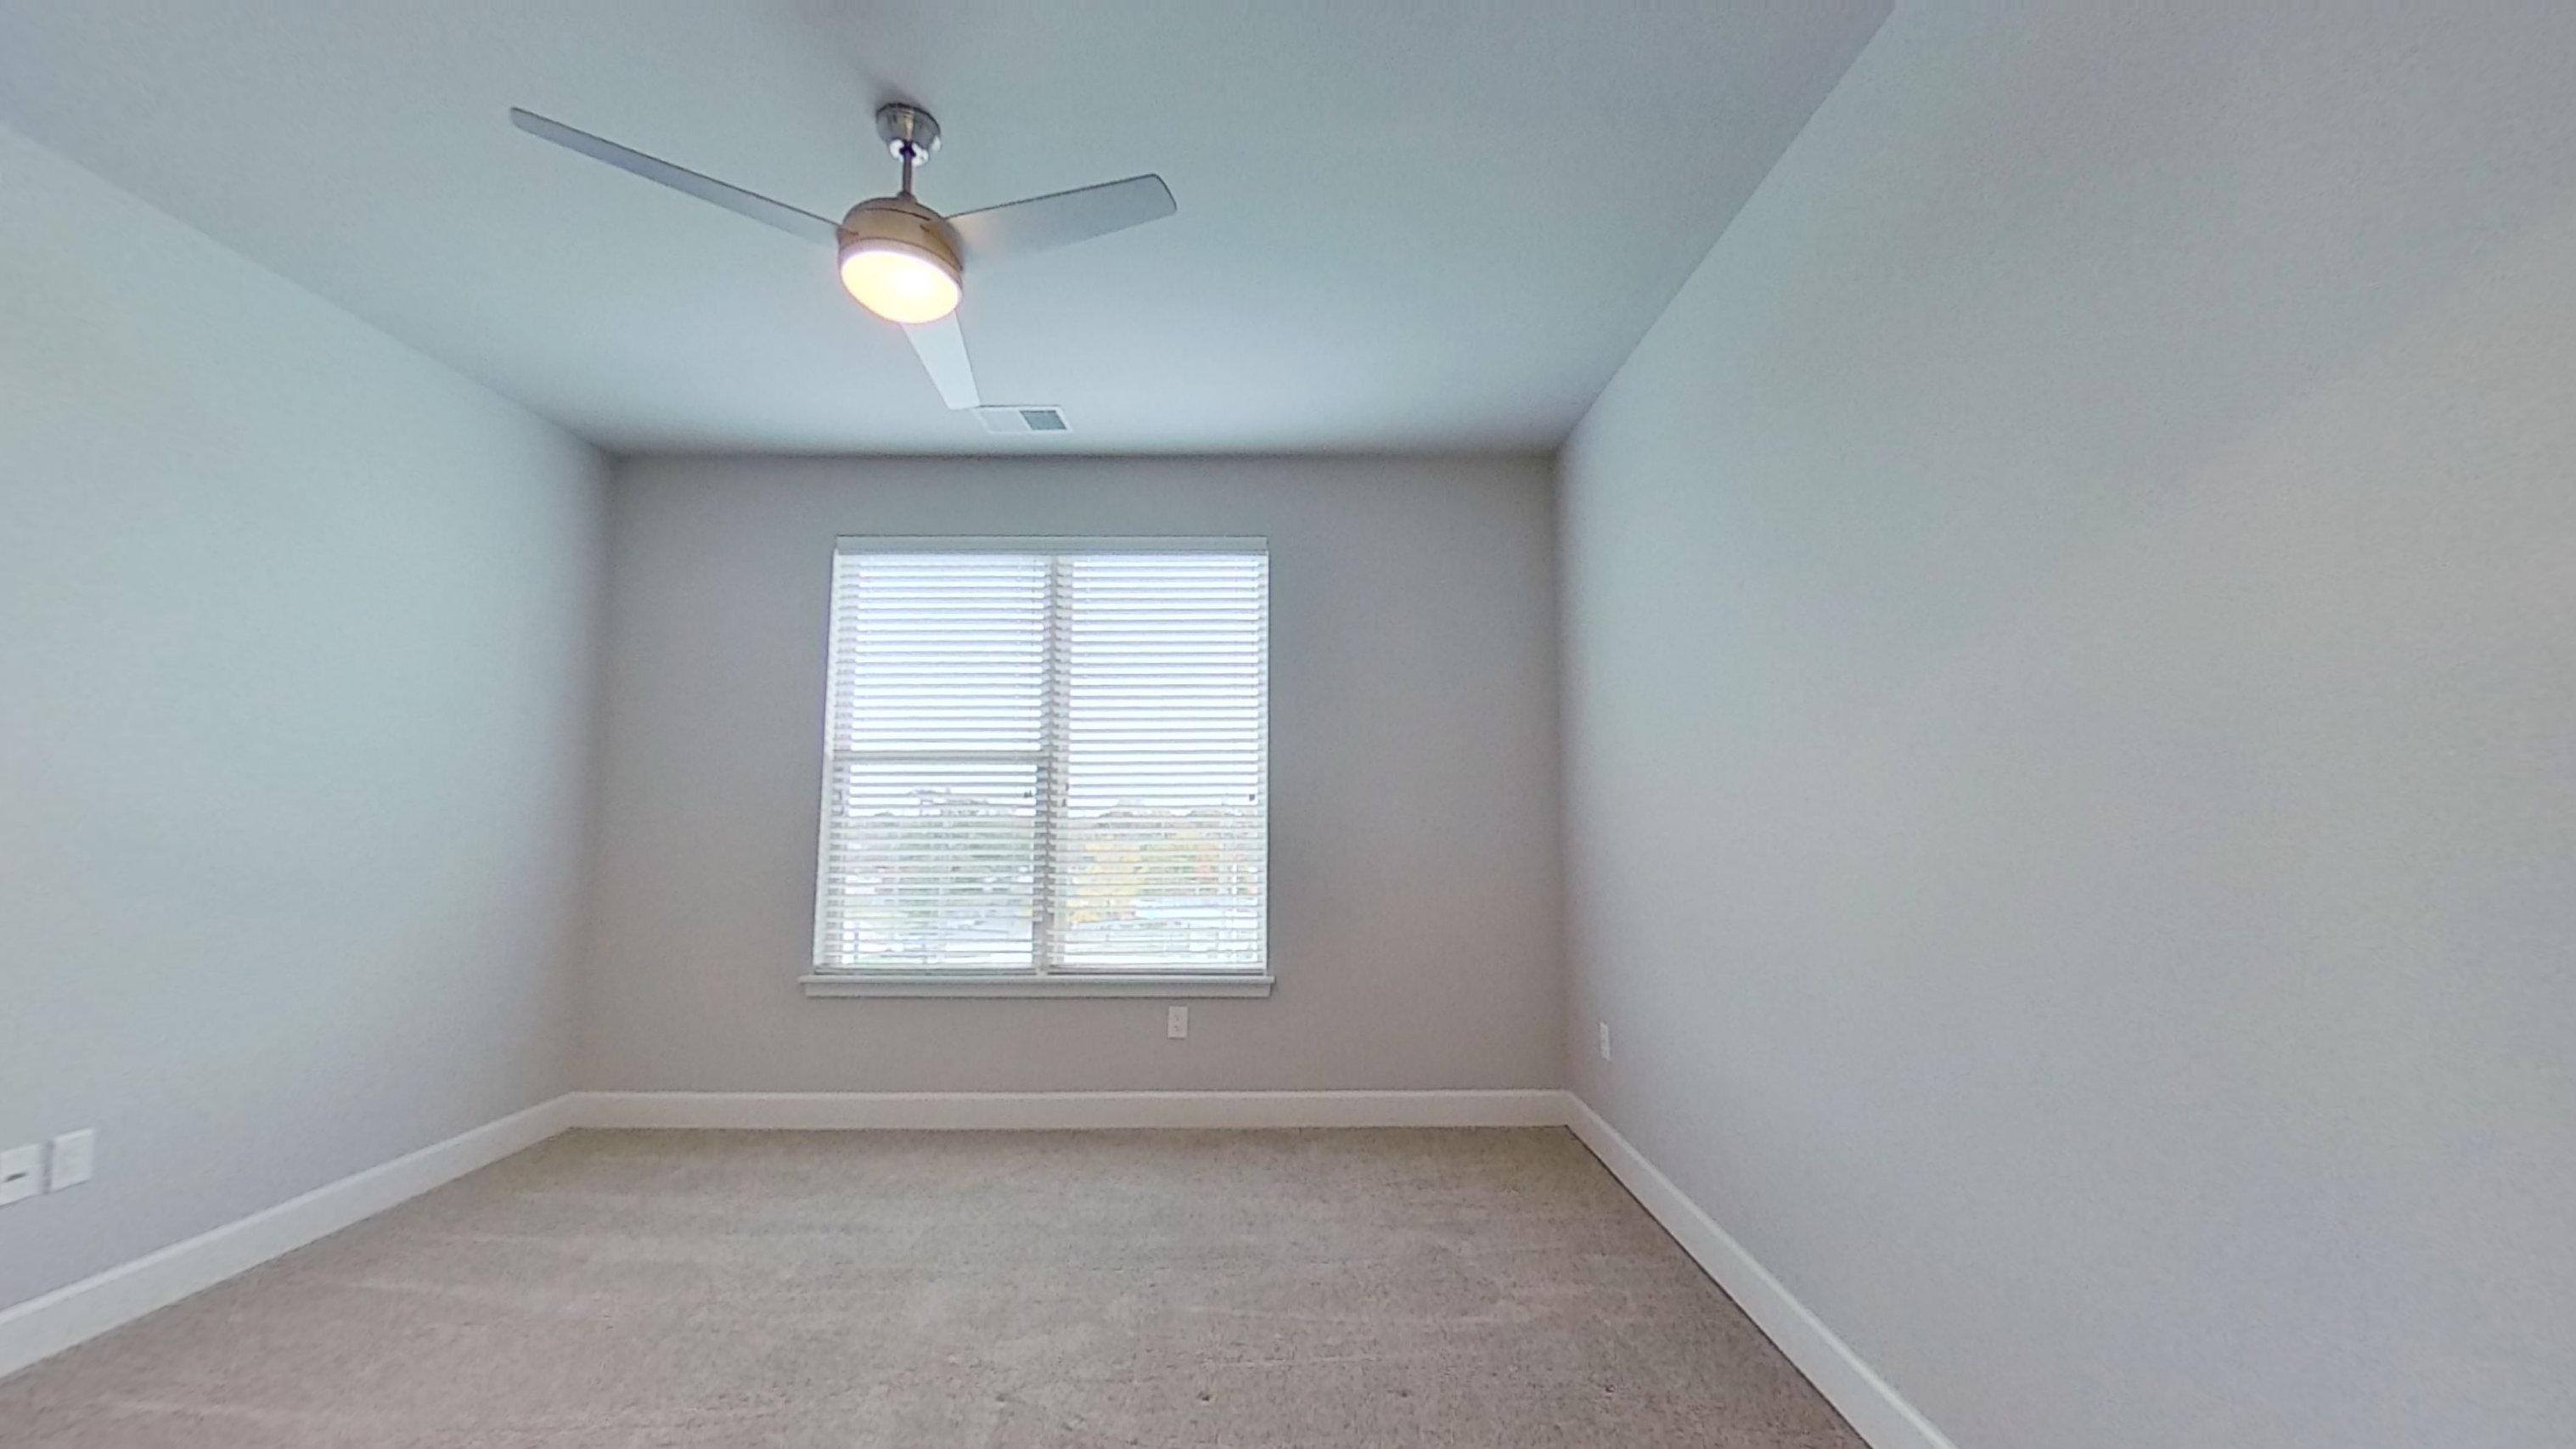 B4 Interior at the Vue at Creve Coeur Apartments in Creve Coeur, MO